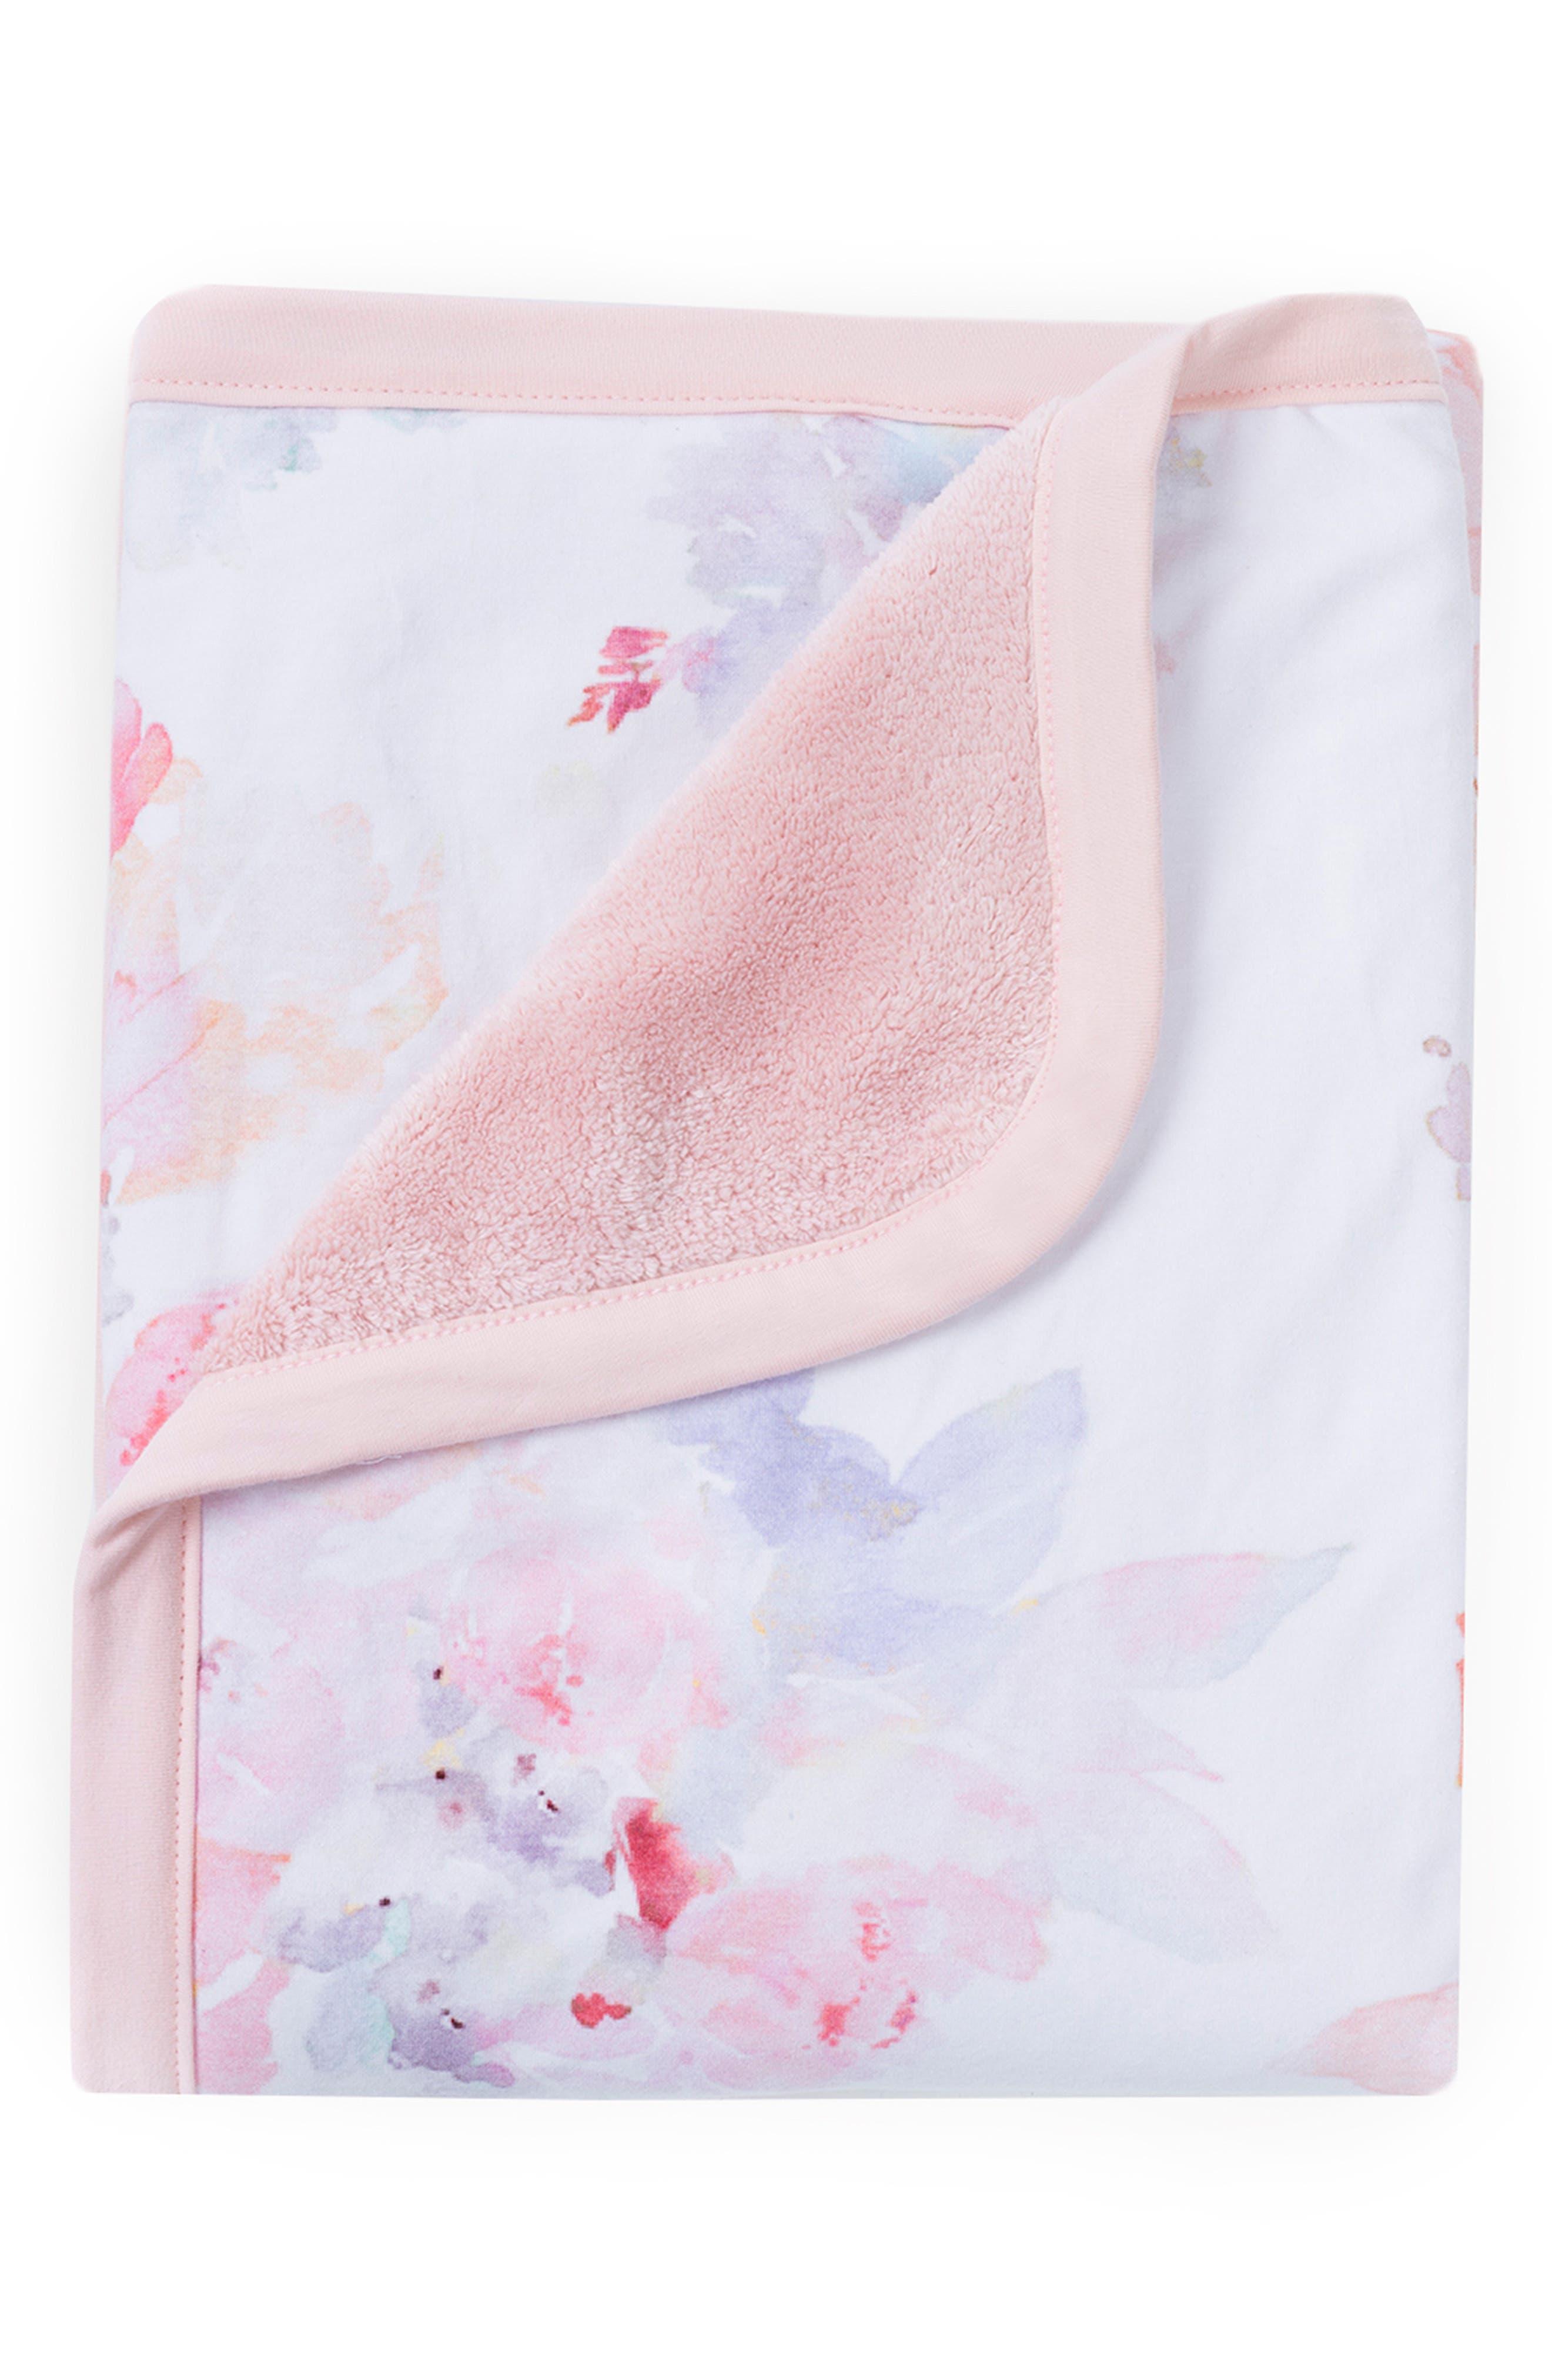 OILO, Prim Cuddle Blanket, Crib Skirt & Crib Sheet Set, Alternate thumbnail 2, color, PRIM